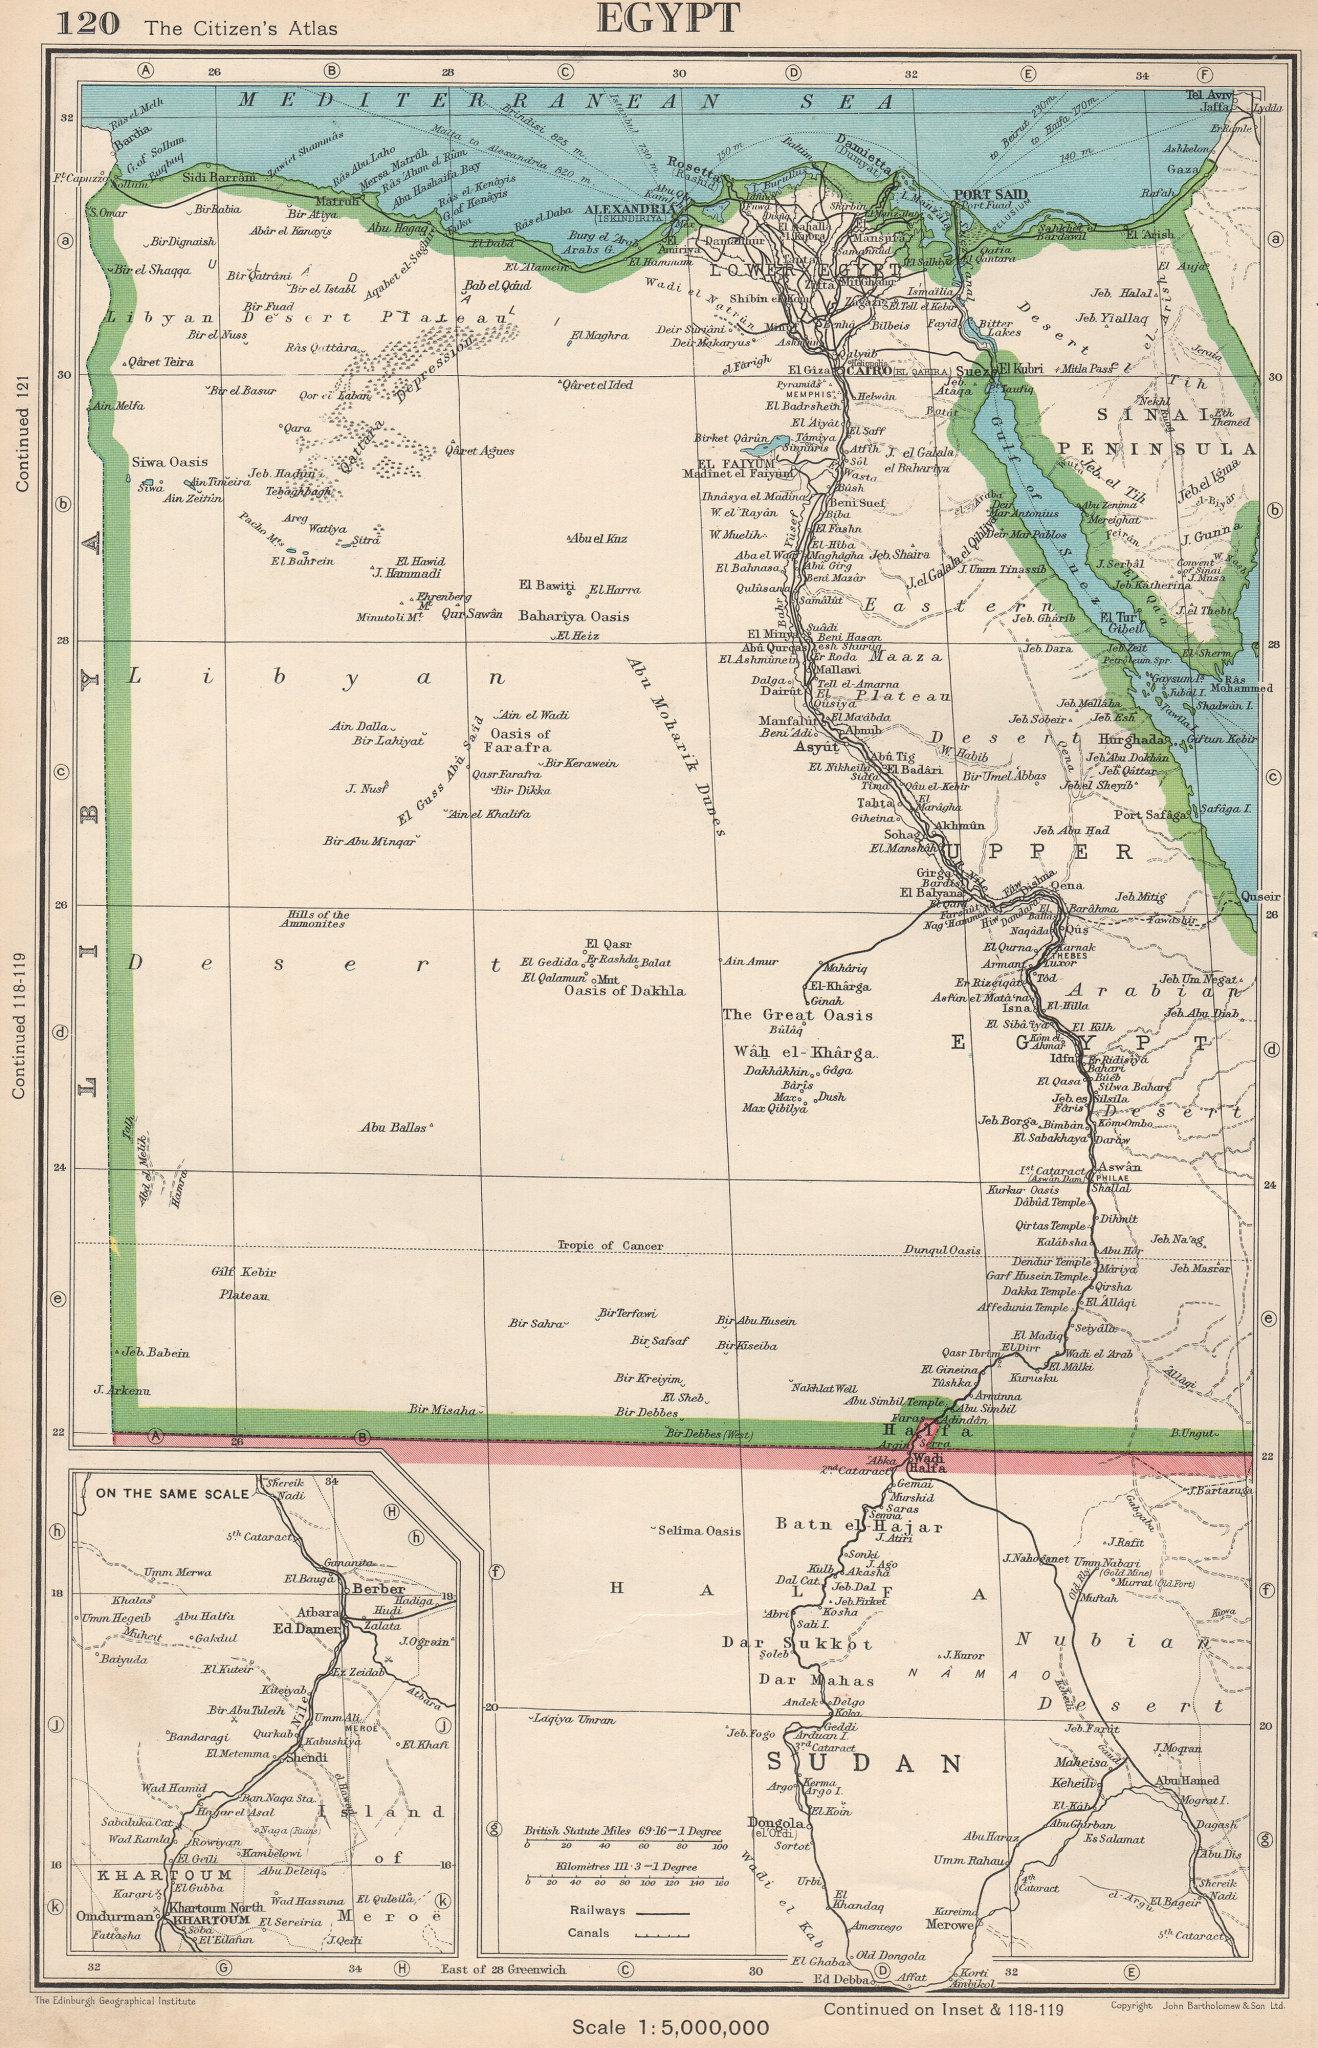 Associate Product EGYPT. & Nile Valley. BARTHOLOMEW 1952 old vintage map plan chart